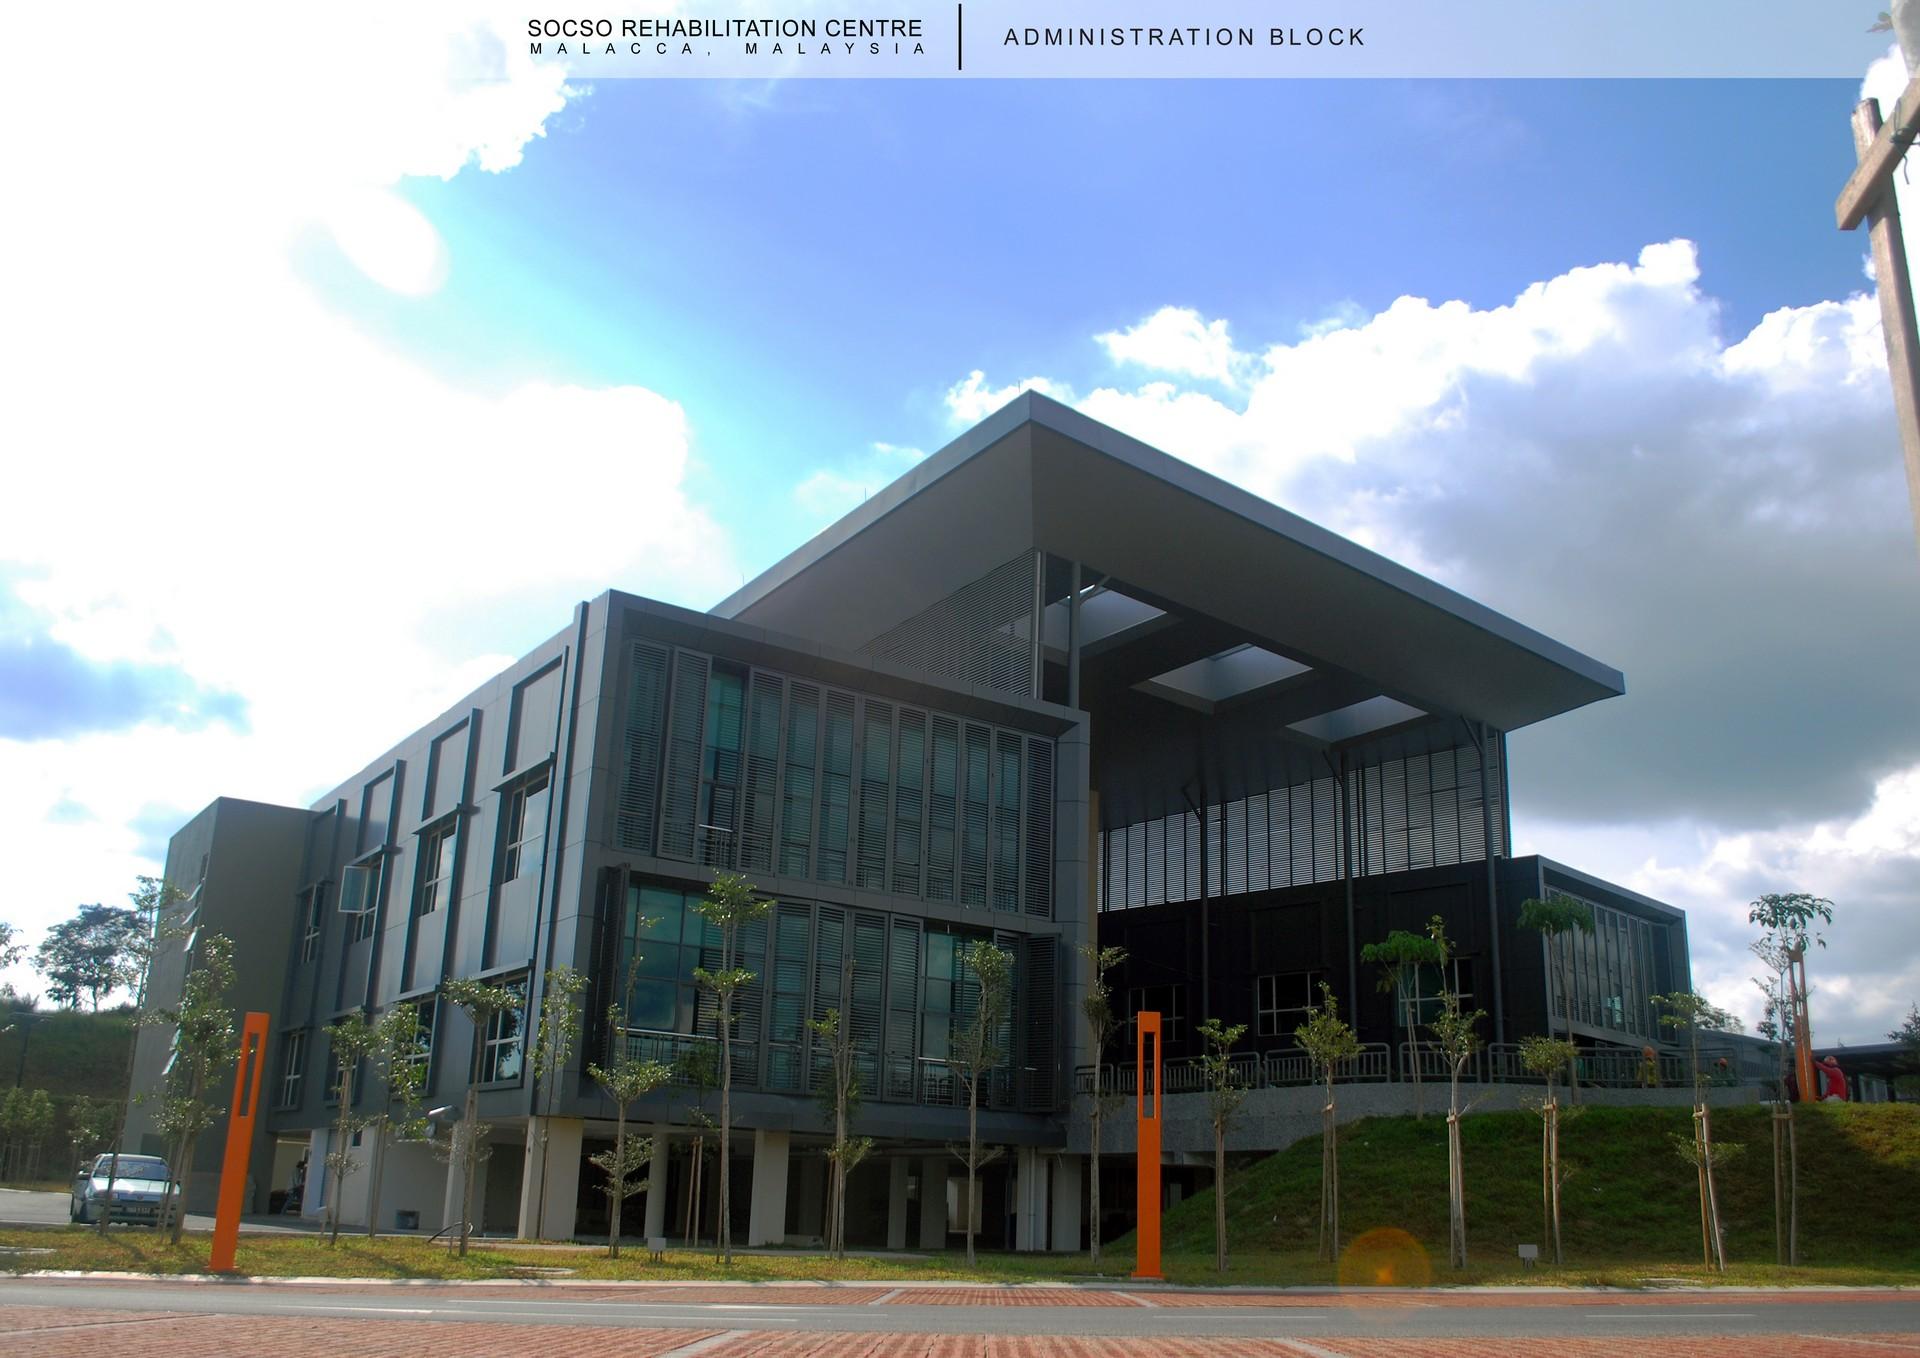 Socso rehabilitation centre